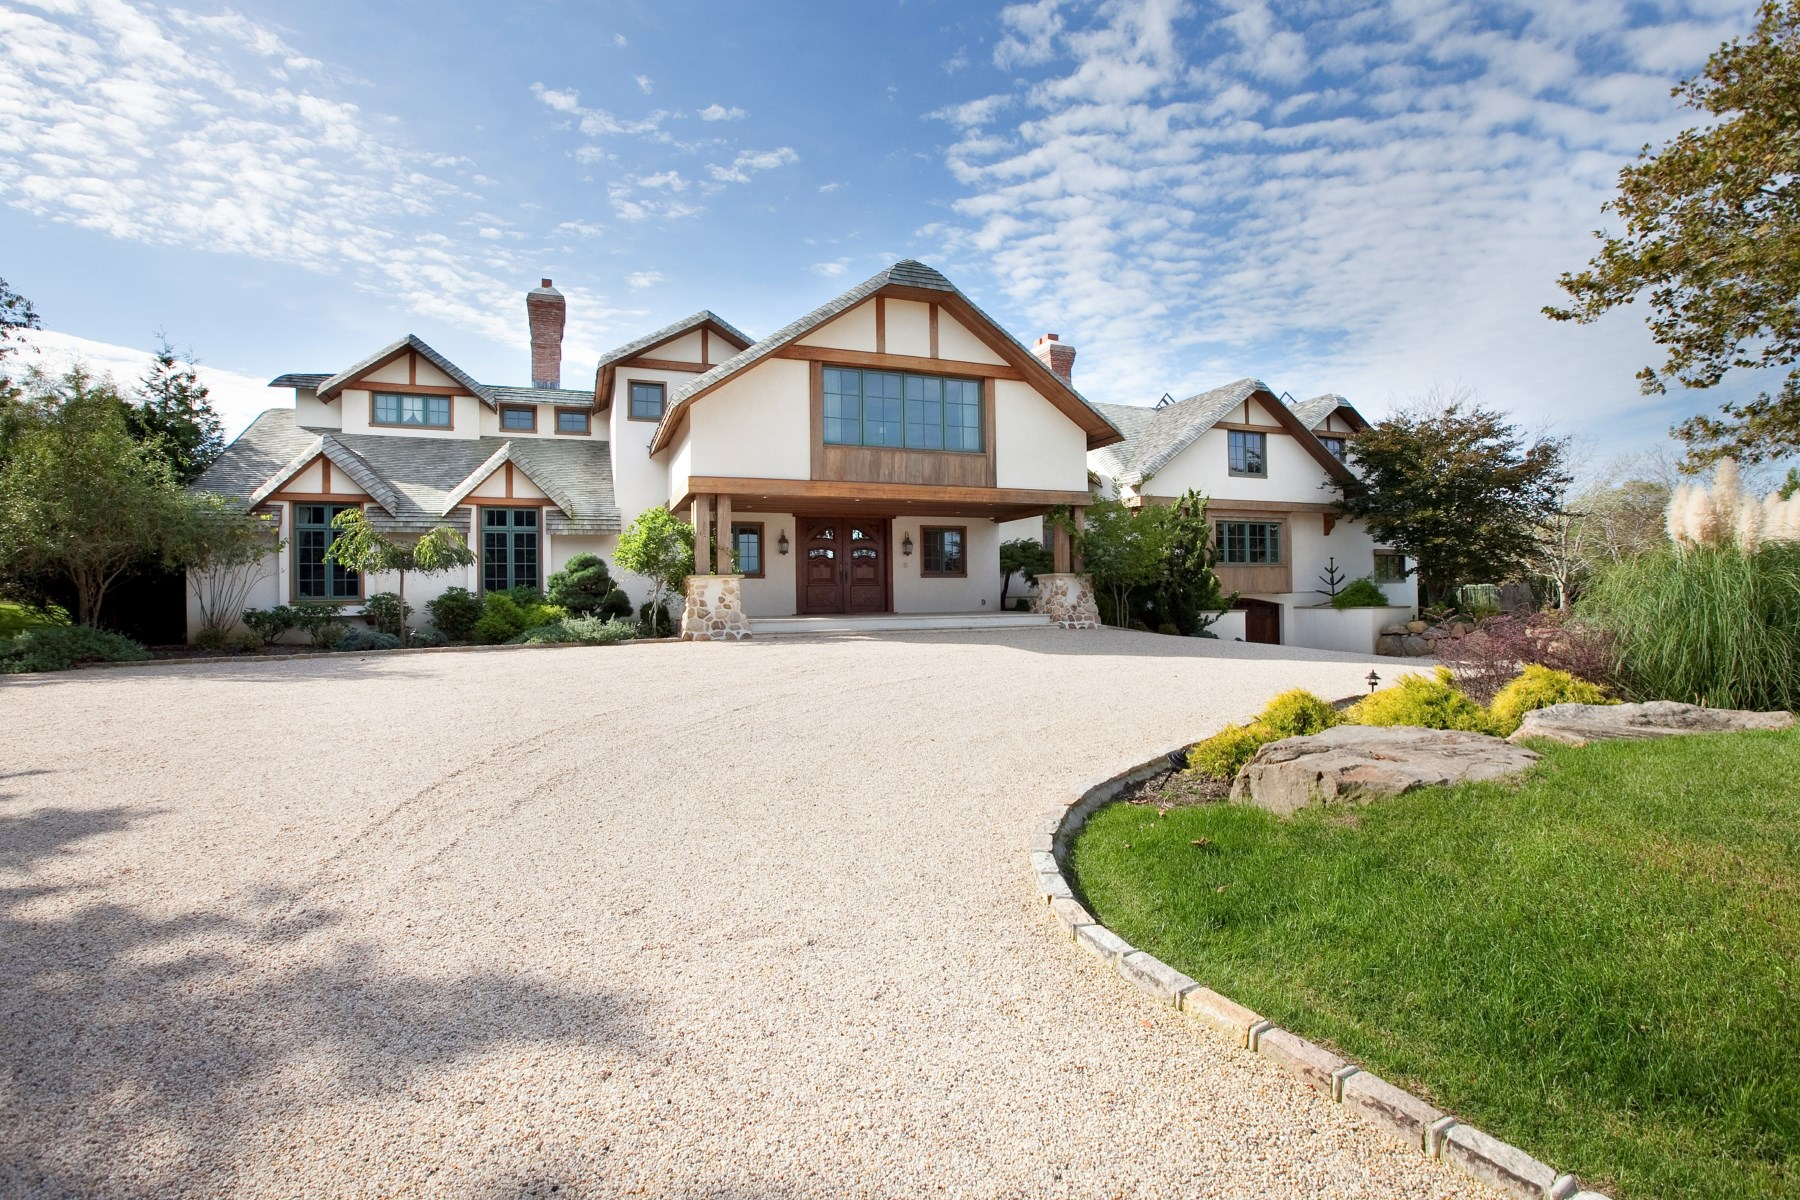 Single Family Home for Rent at Ocean Breezes Amagansett, New York, 11930 United States